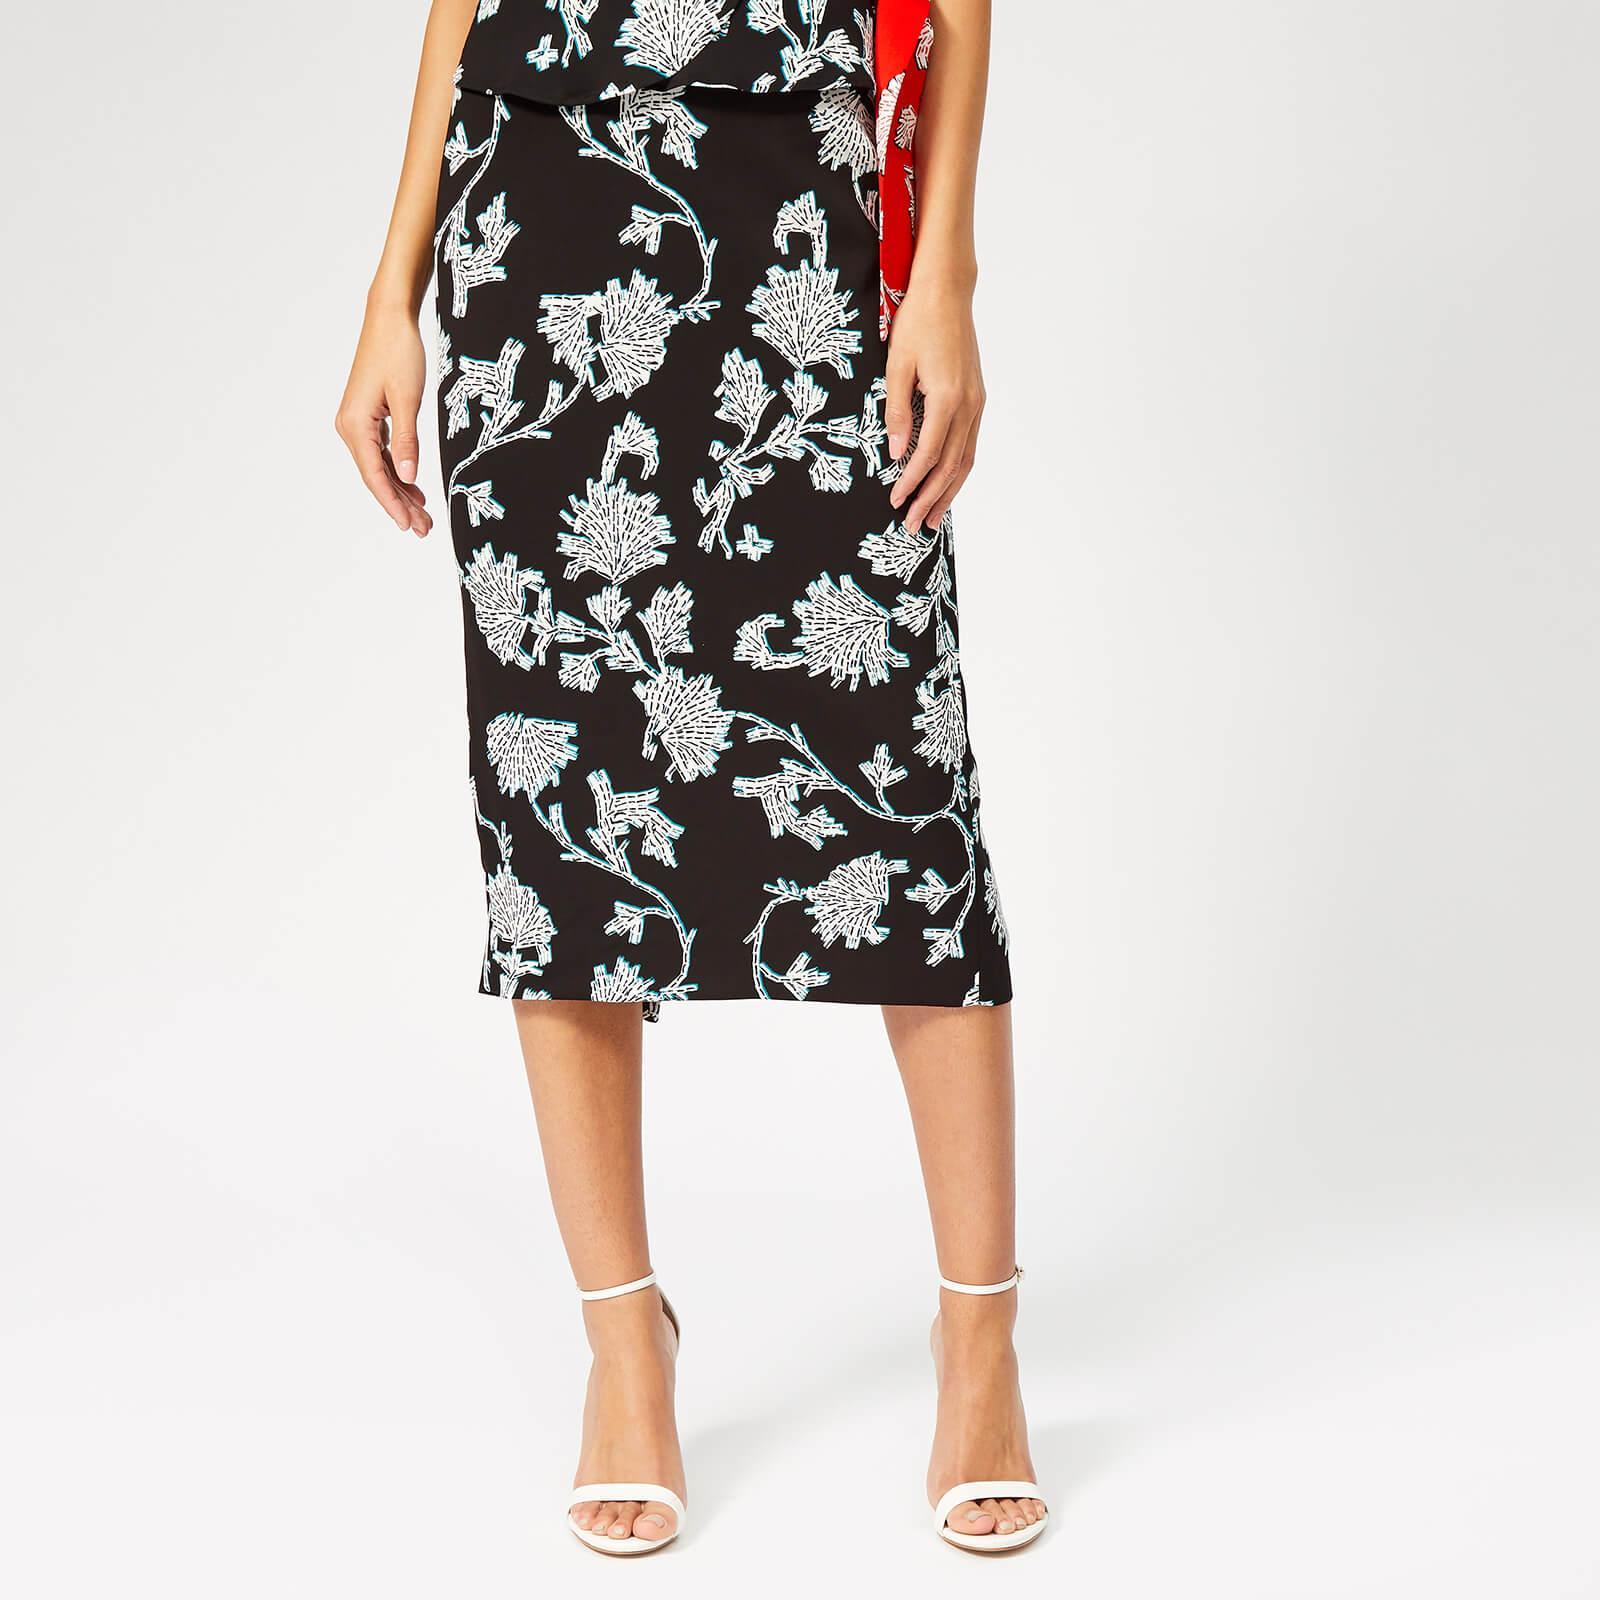 977a8895d Diane von Furstenberg - Black Single-vented Skirt - Lyst. View fullscreen